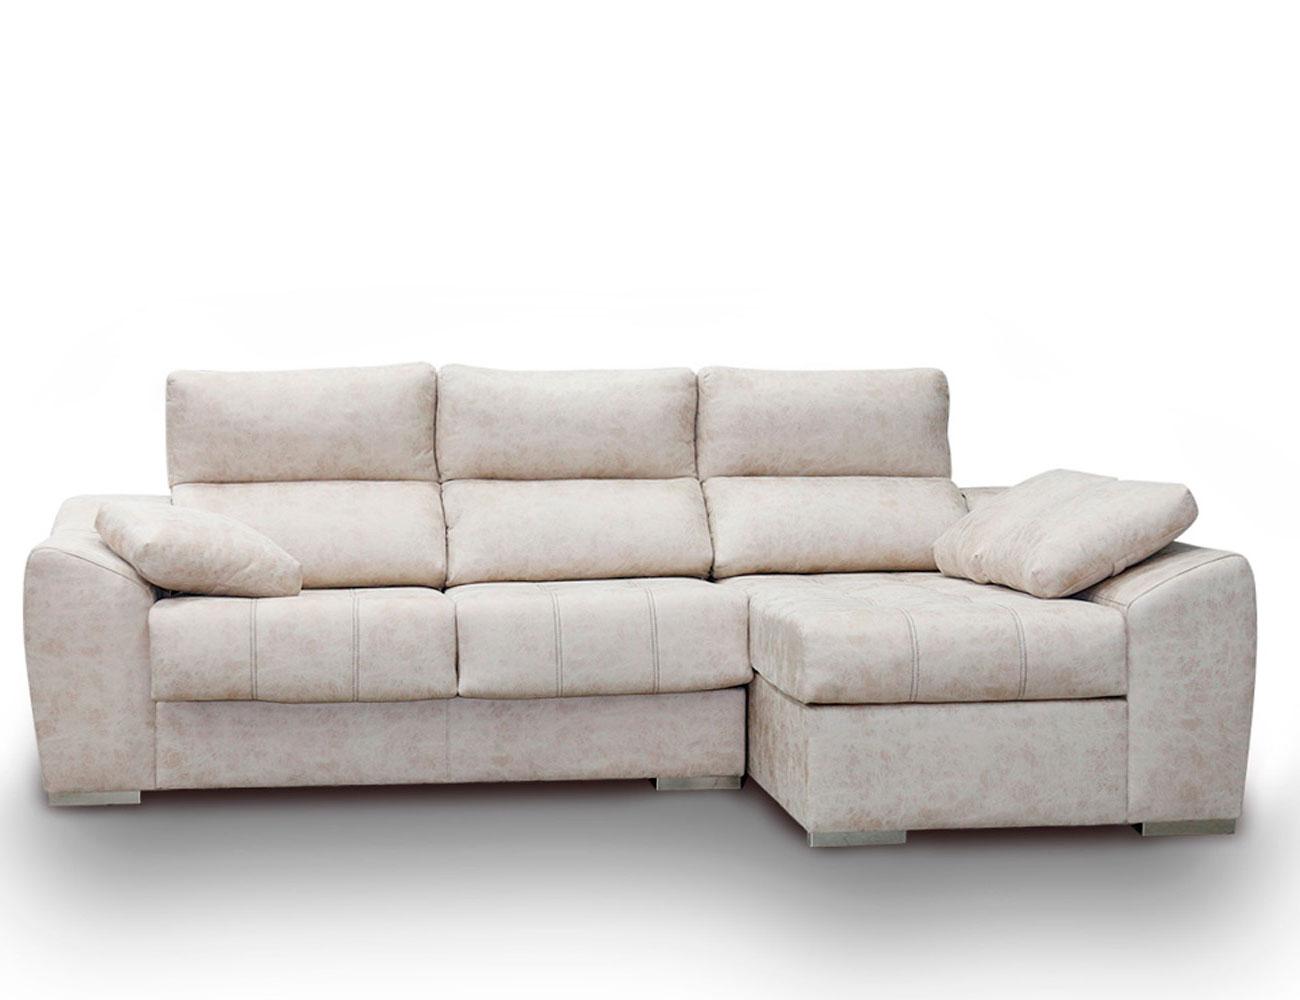 Sofa chaiselongue anti manchas beig blanco261